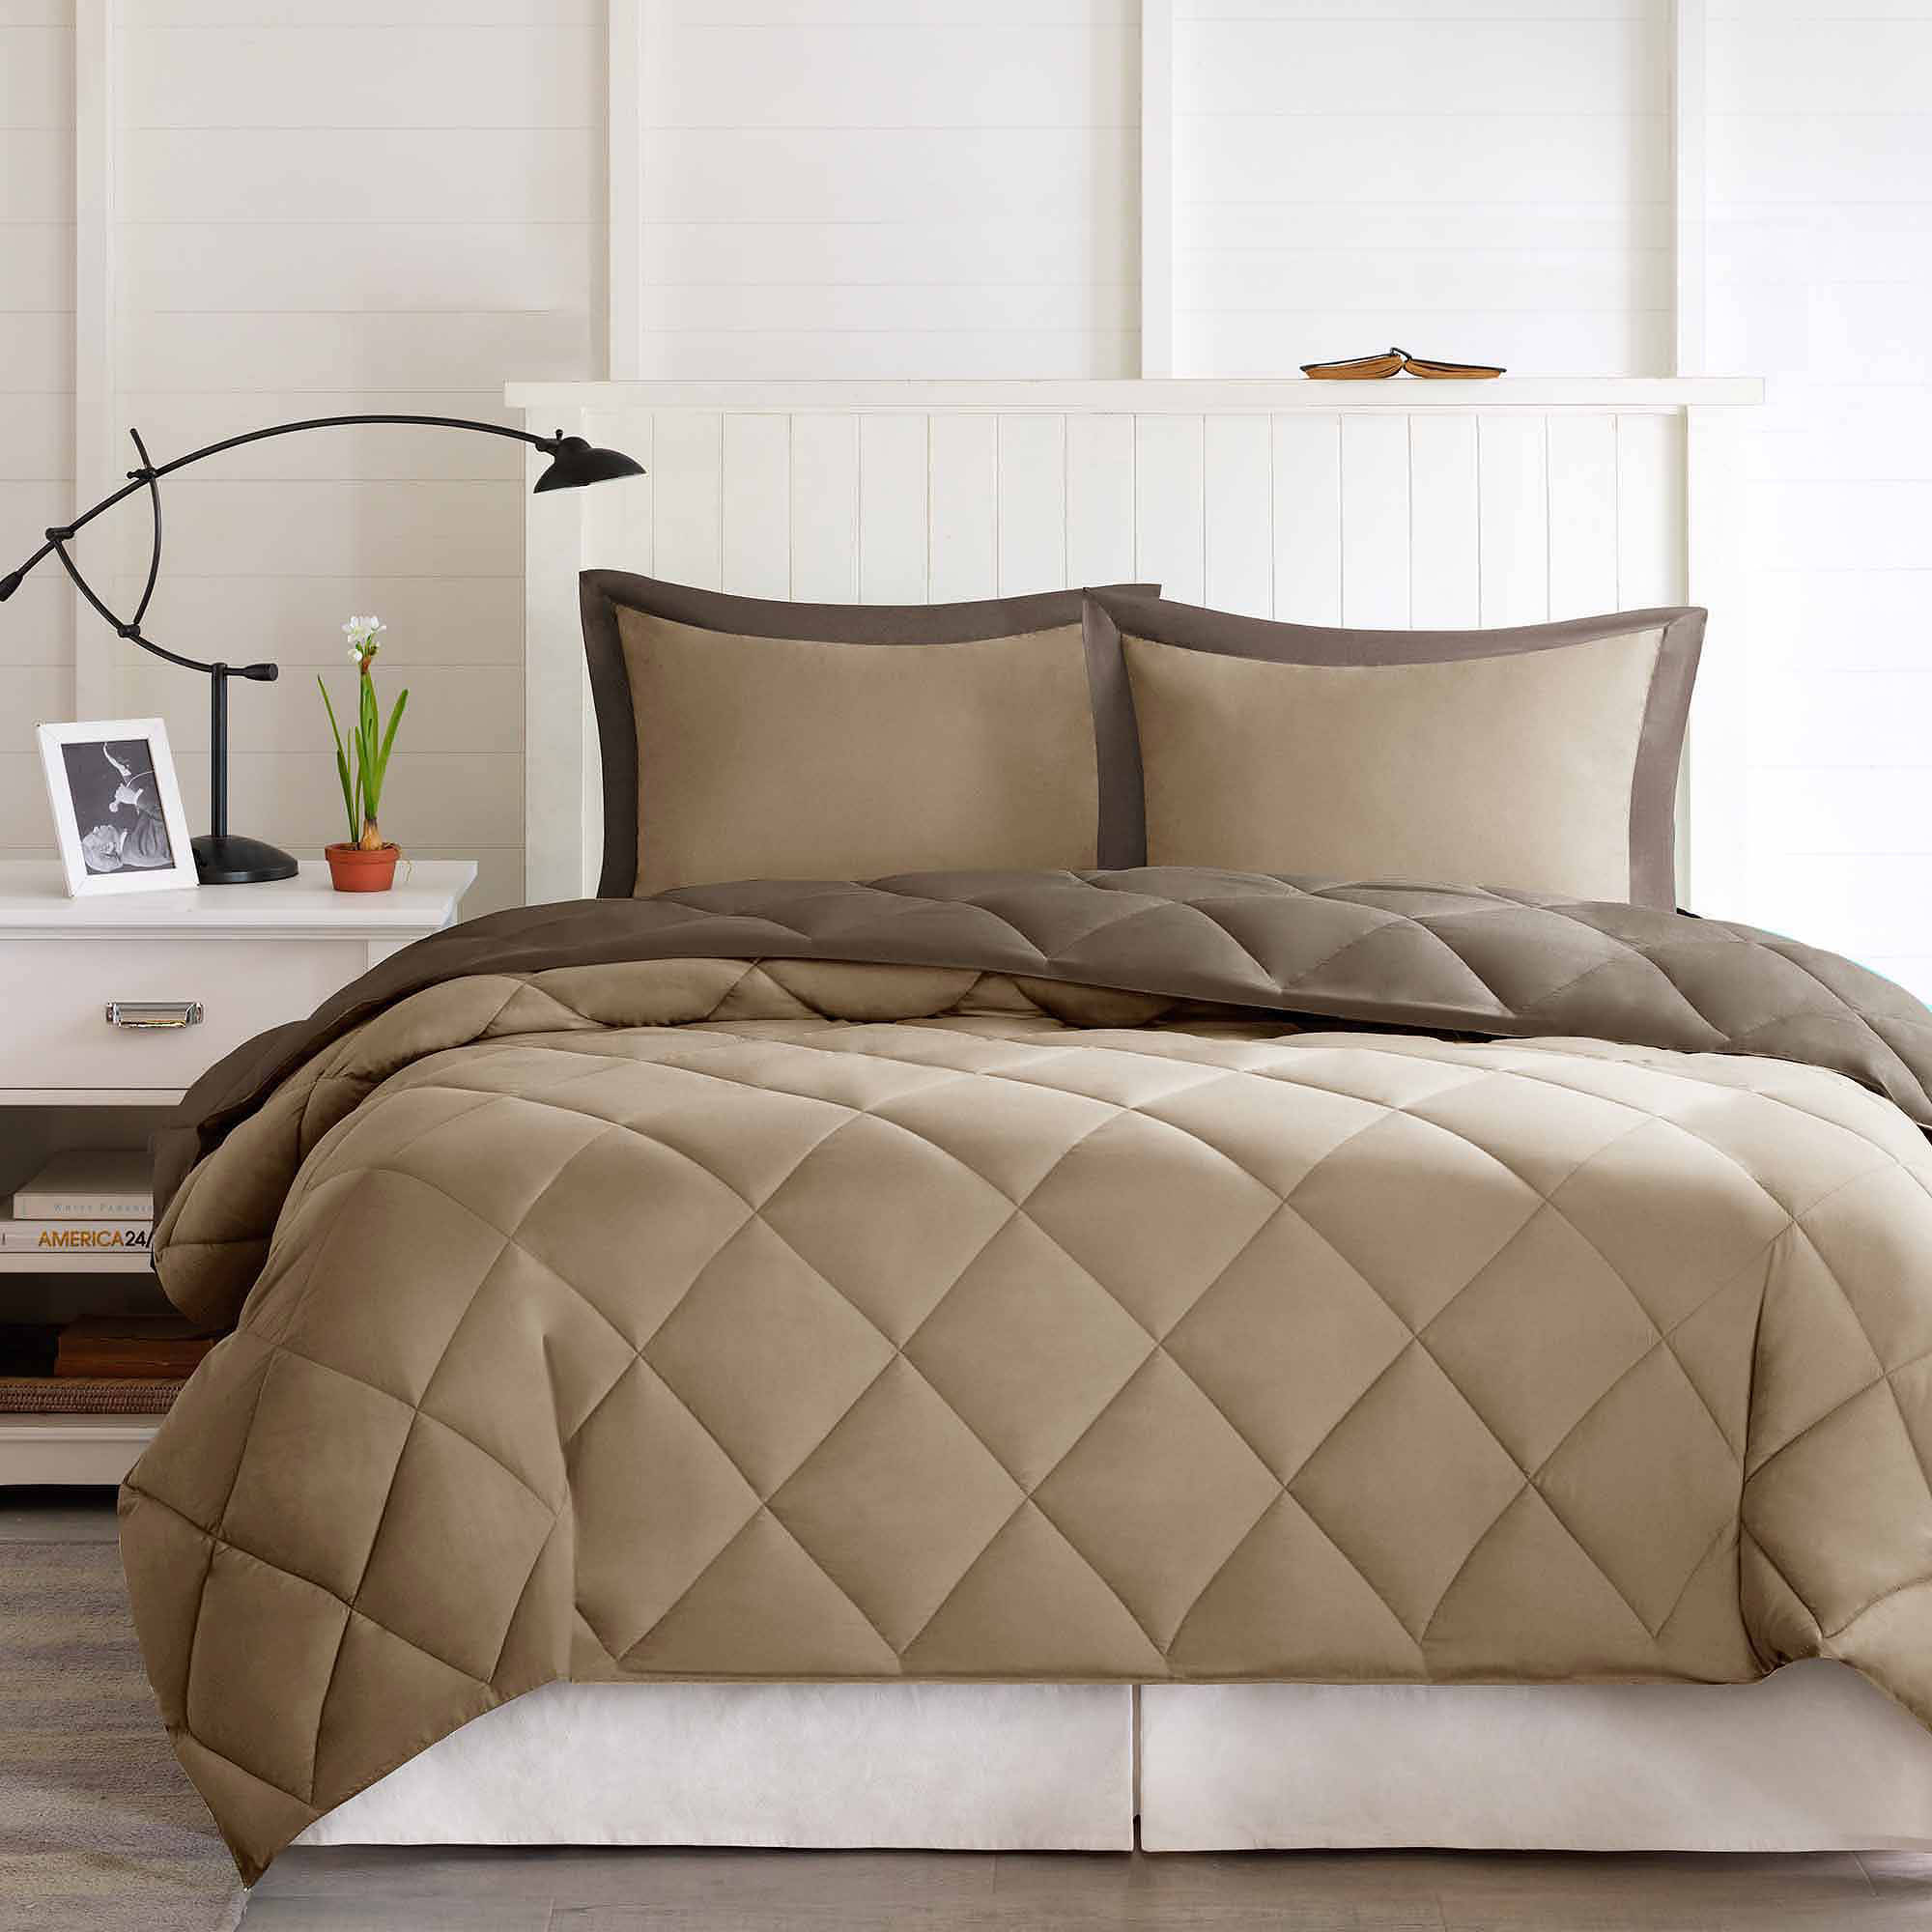 Comfort Classics Windsor Microfiber Down Alternative Comforter with 3M Scotchgard